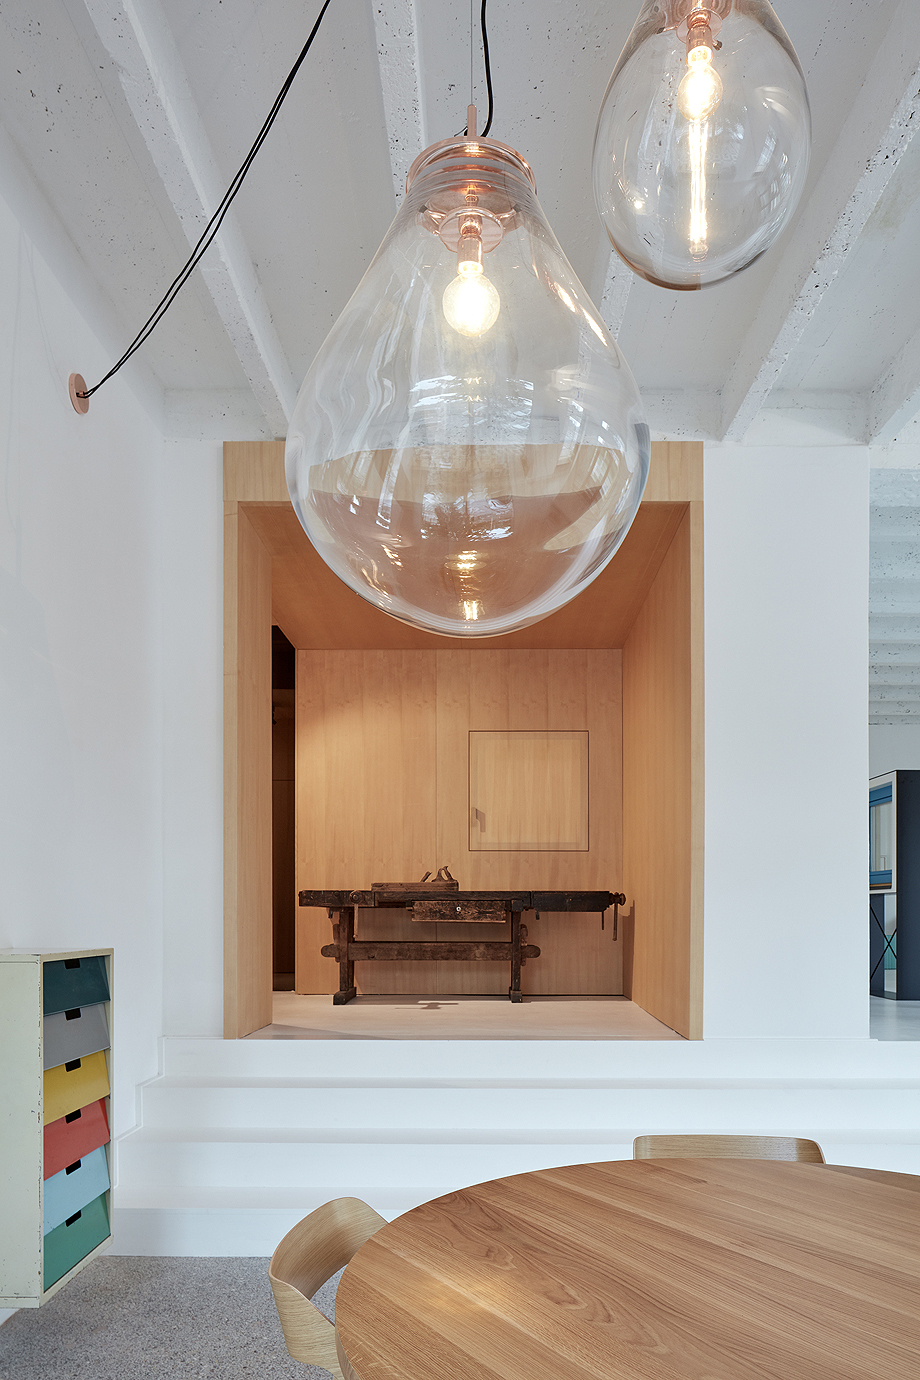 showroom janosik de mjolk architects (3)